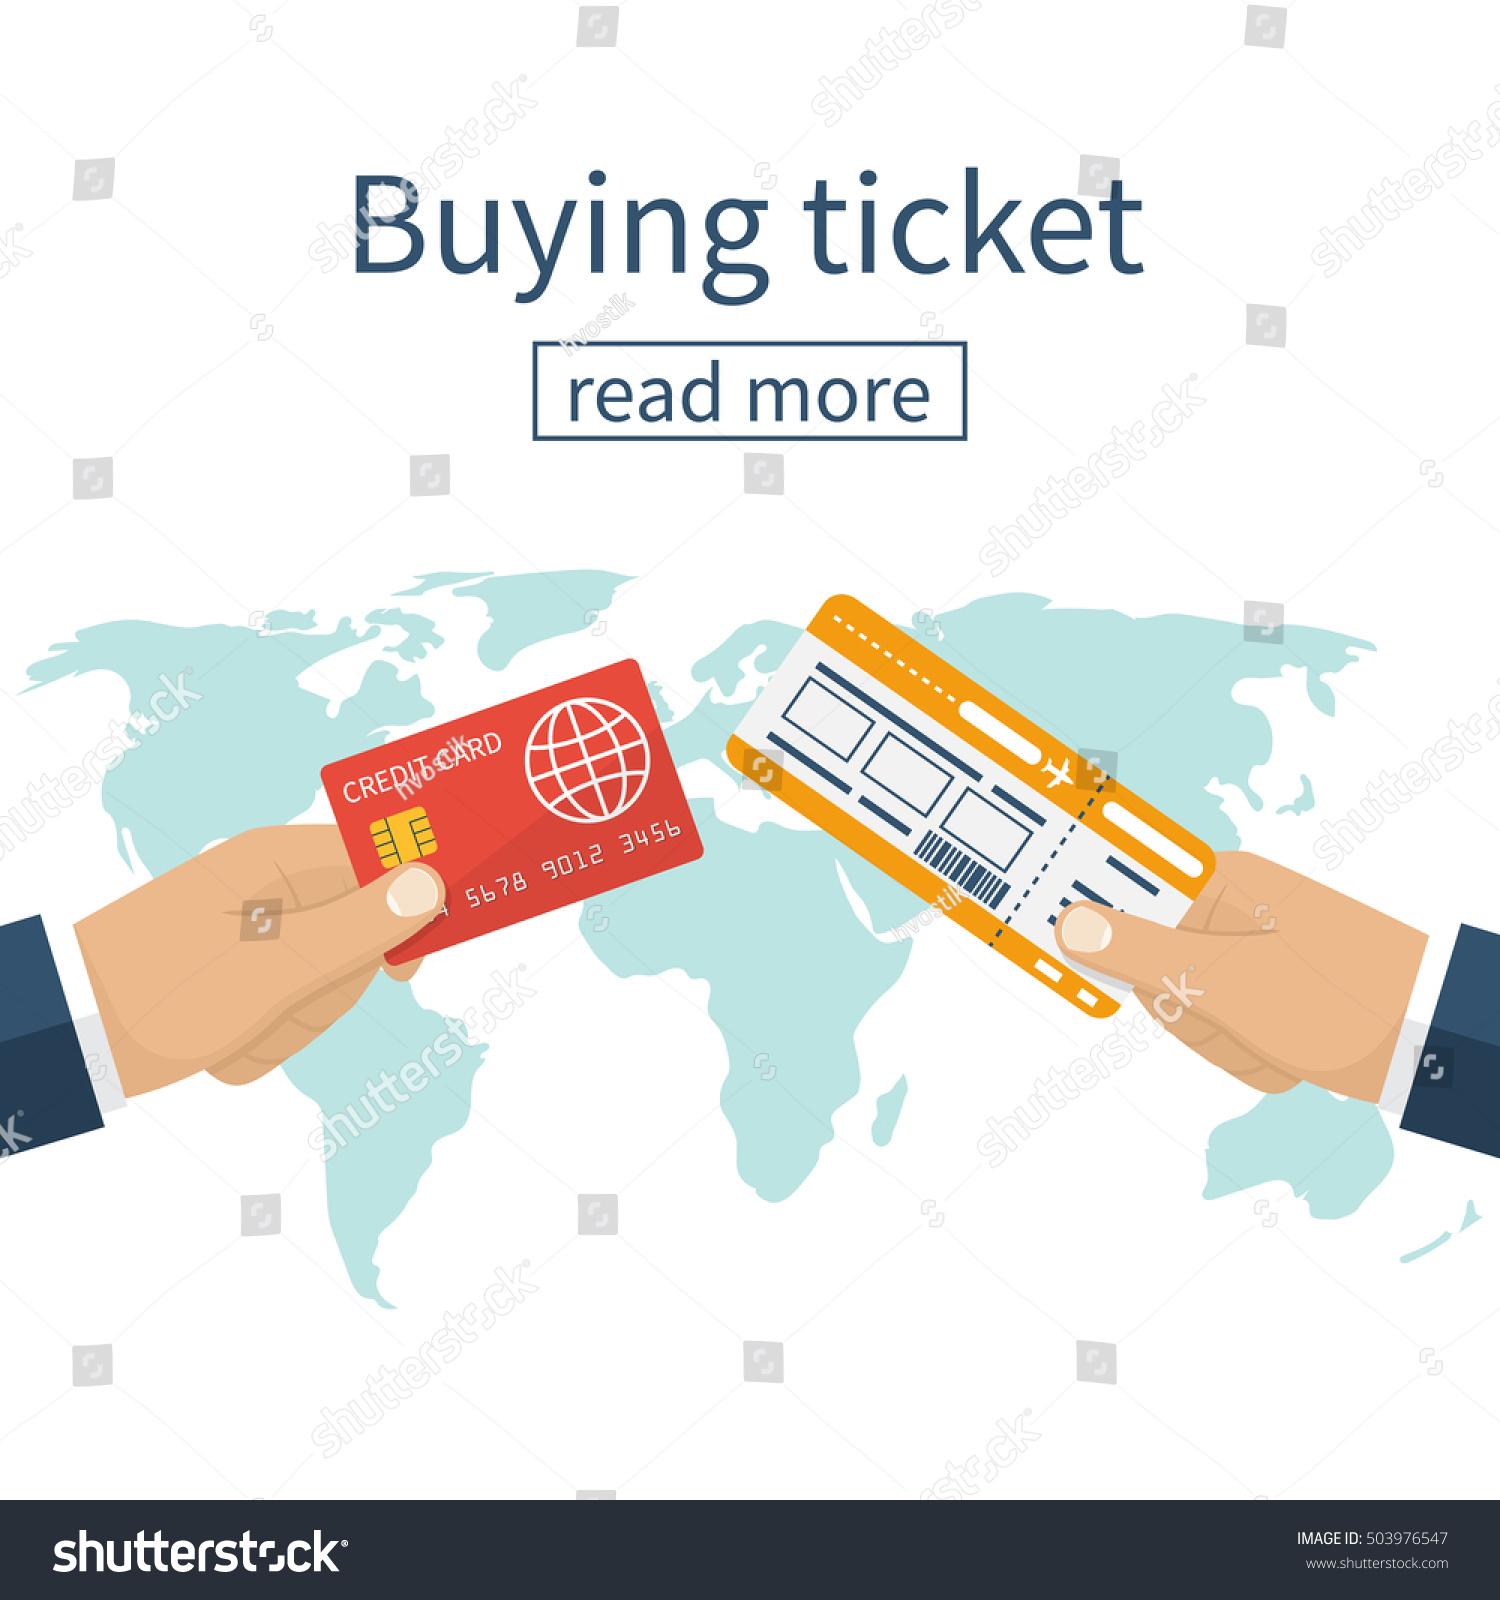 Buy Travel Tickets Online: Buy Airline Ticket Hand Credit Card Stock Vector 503976547